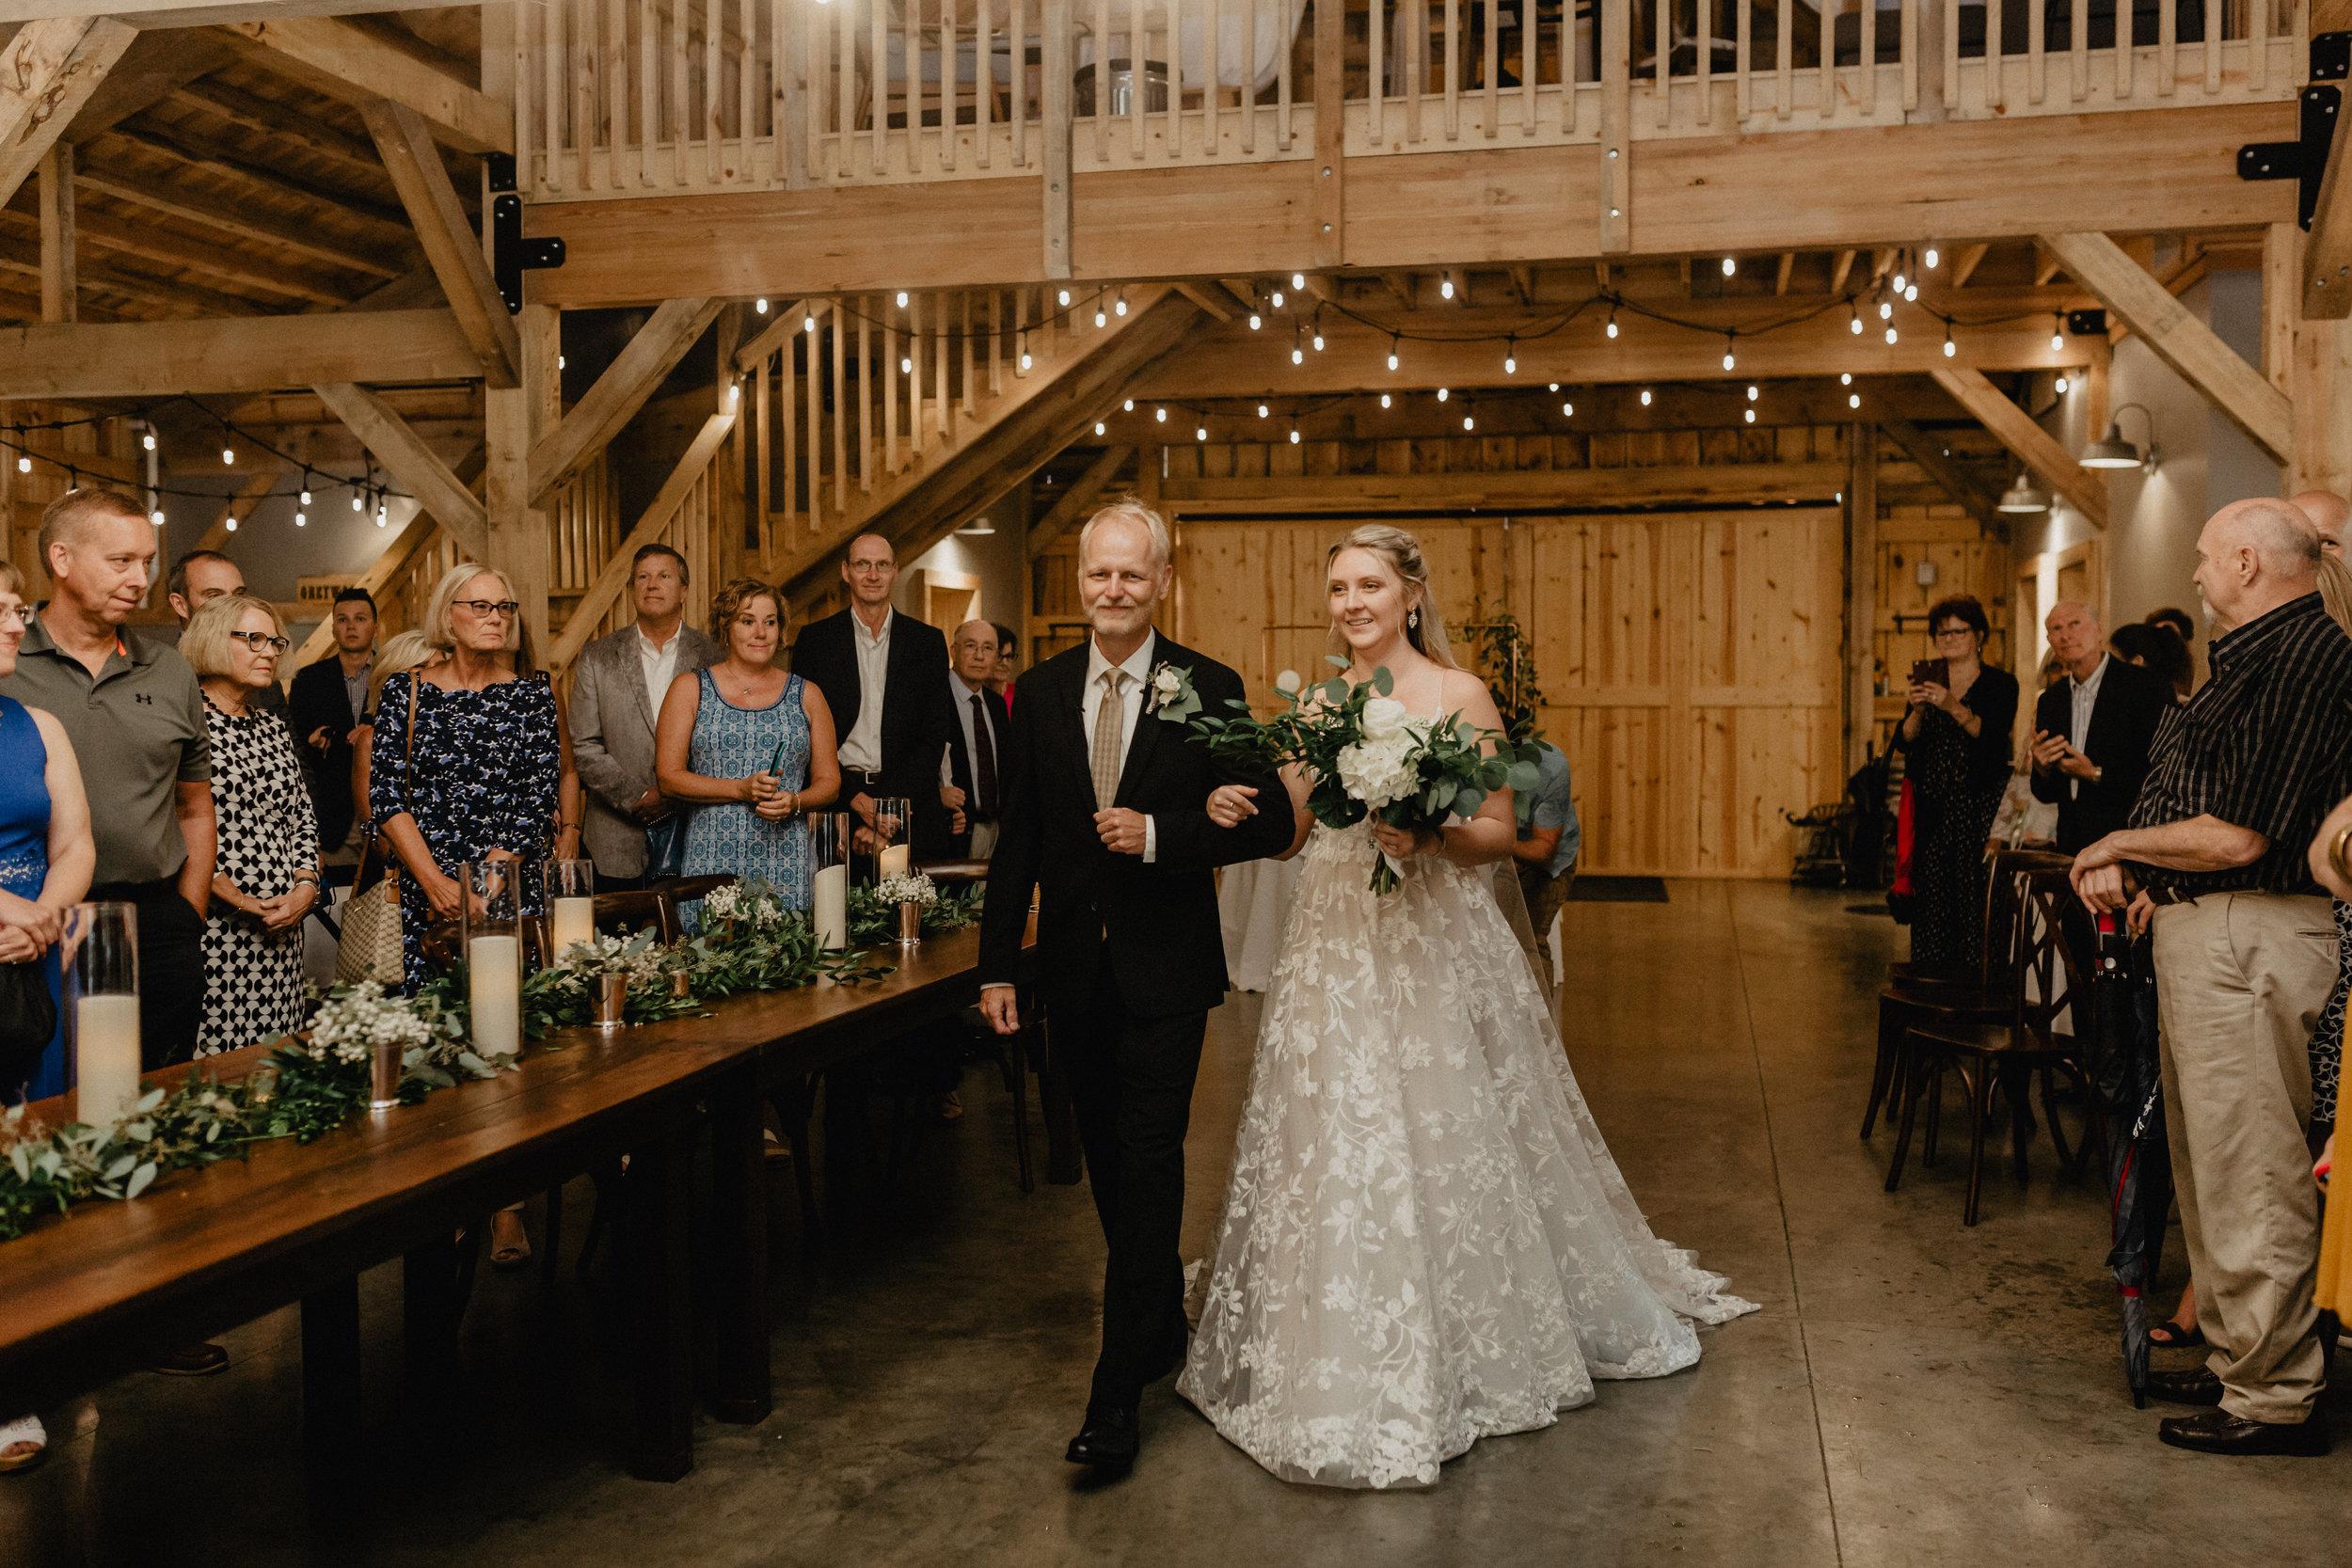 greywacke-meadows-wedding-34.jpg